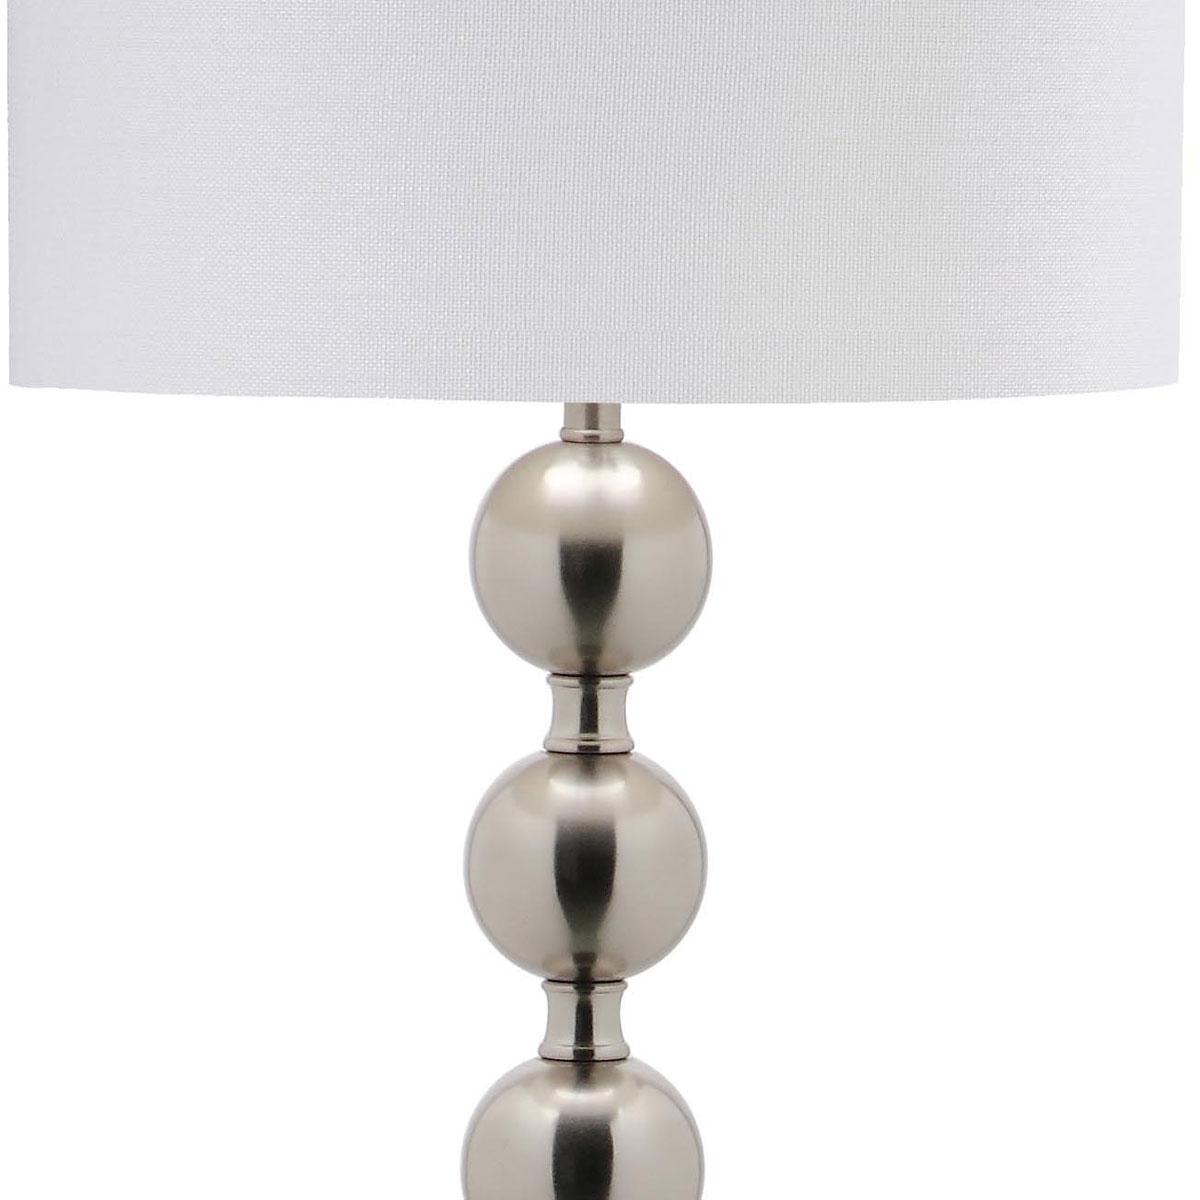 LIT4330A Floor Lamps - Lighting by Safavieh